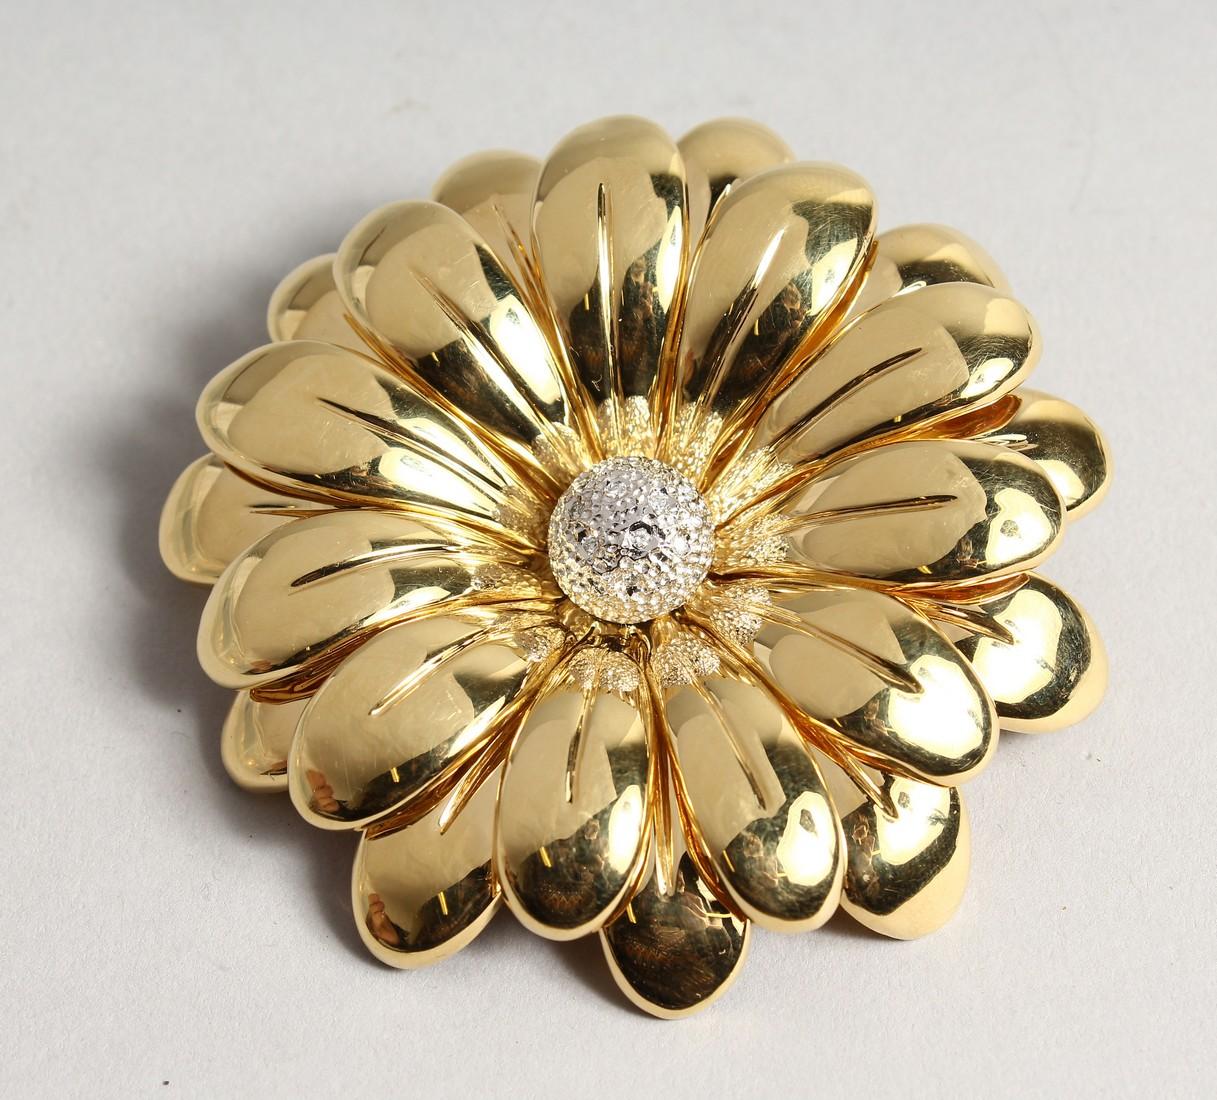 A SUPERB 18CT GOLD FLOWER BROOCH 7cm diameter, with P set diamond centre. 48gms